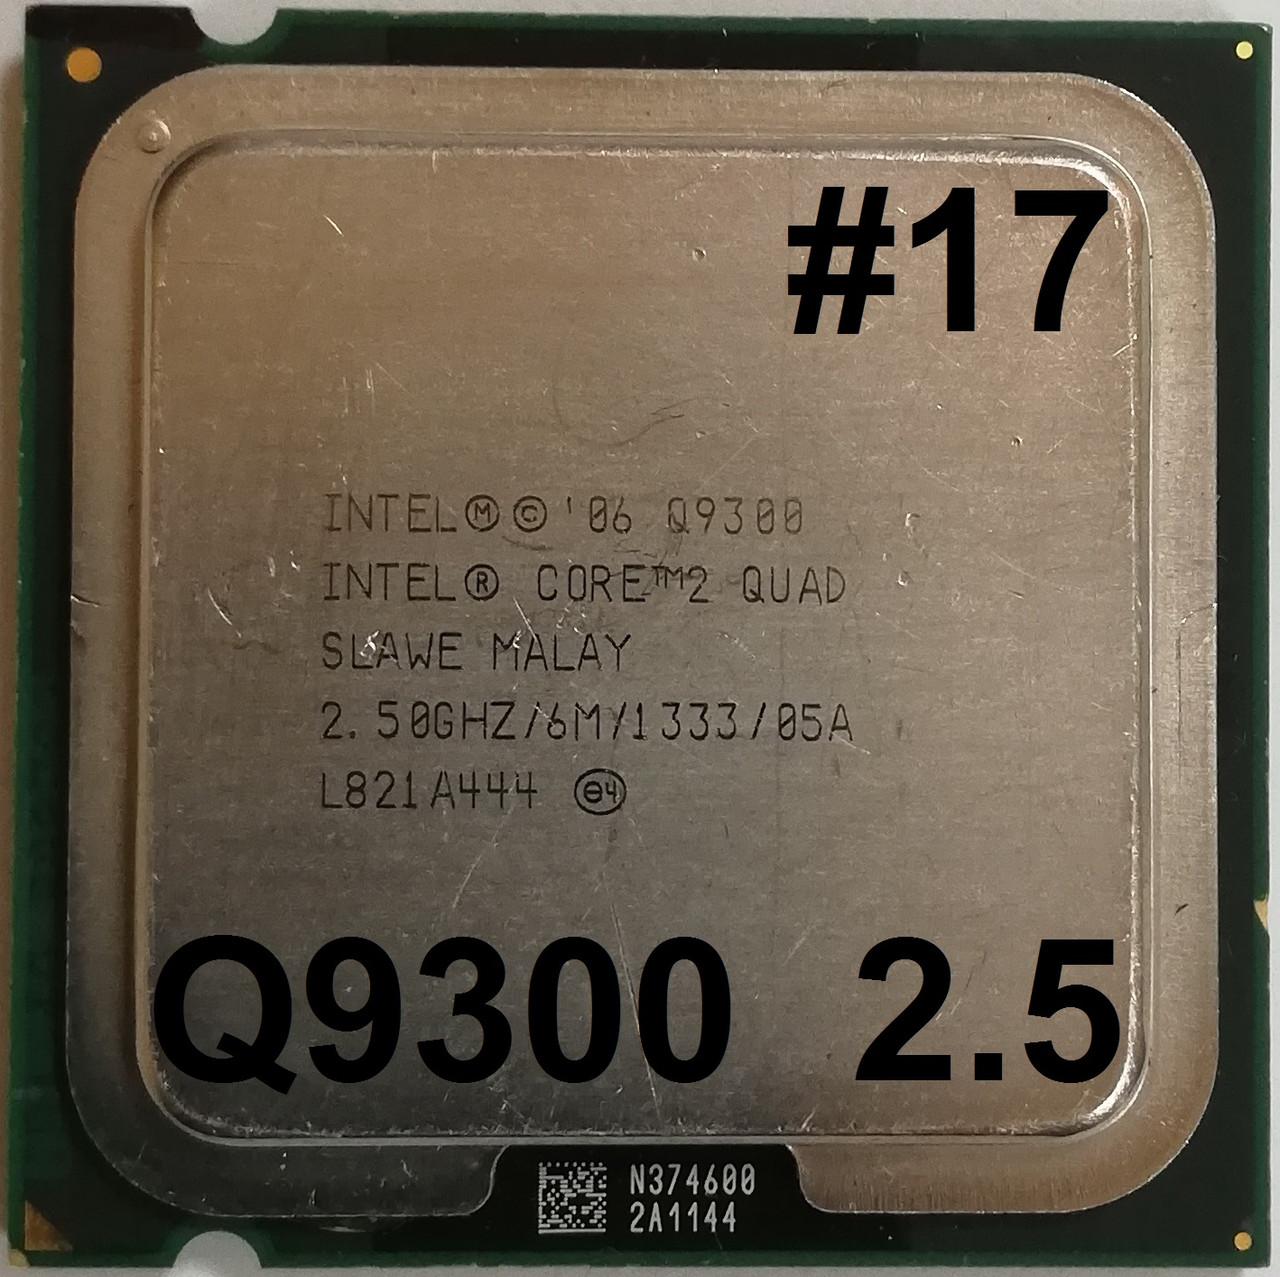 Процессор ЛОТ#17 Intel® Core™2 Quad Q9300 M1 SLAWE 2.5GHz 6M Cache 1333 MHz FSB Socket 775 Б/У